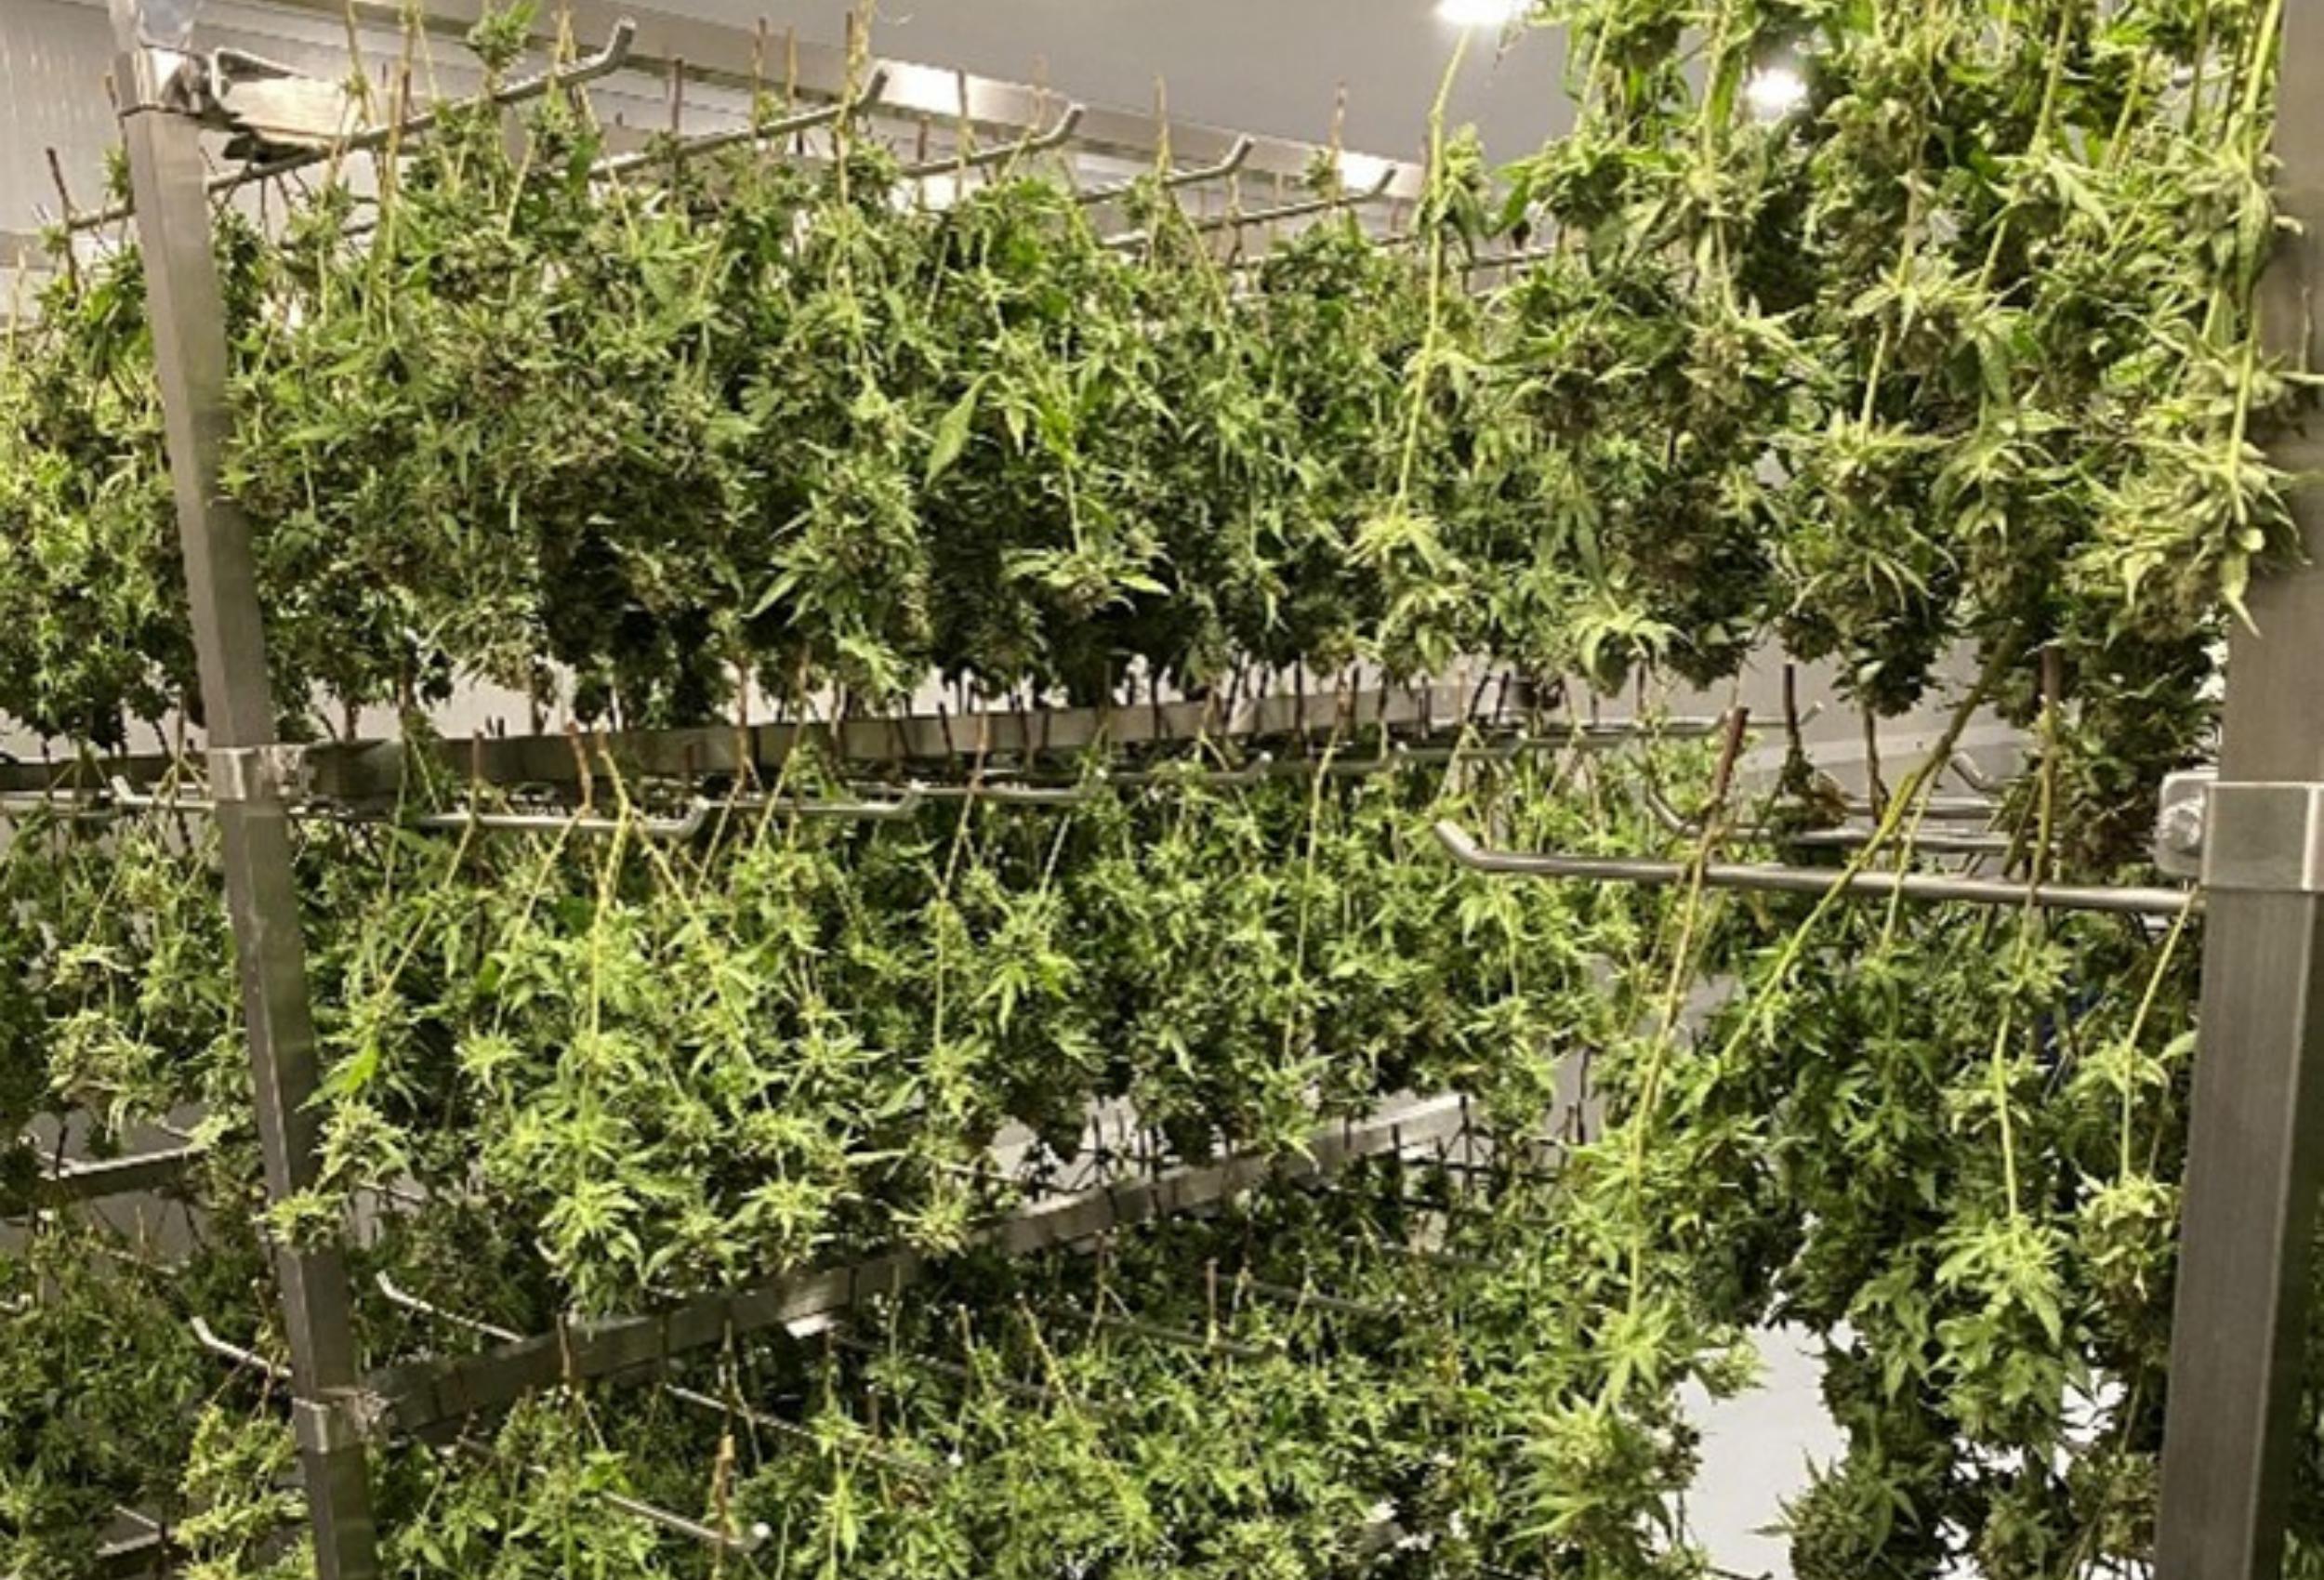 Navaya's first major cannabis harvest